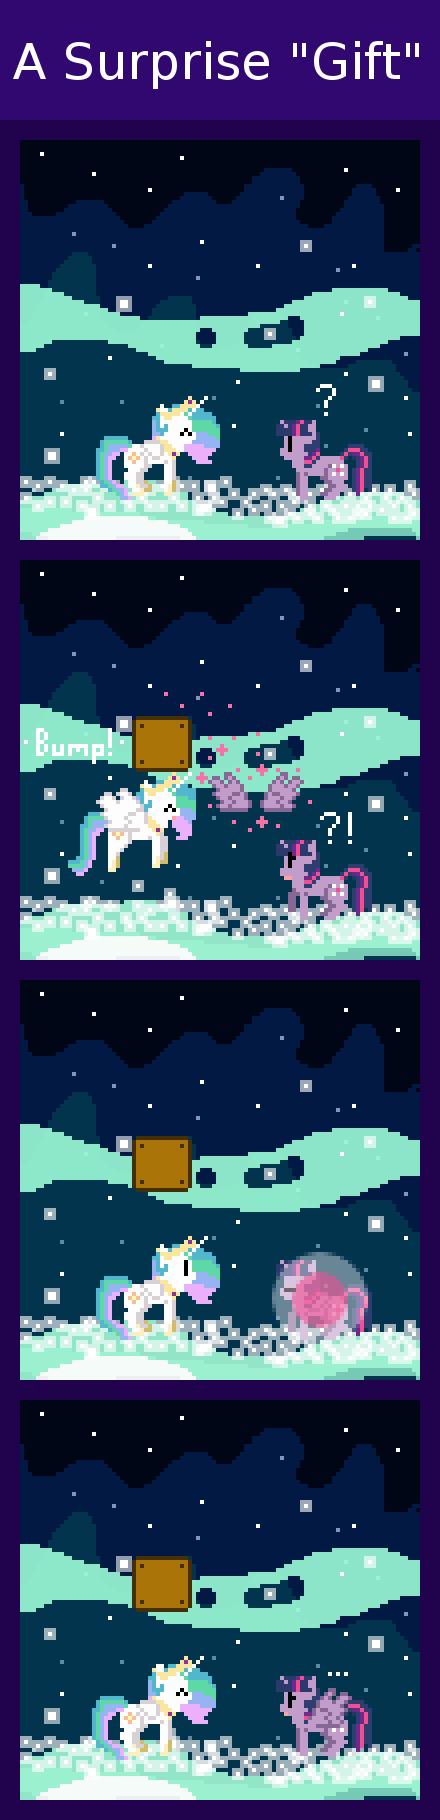 "A Surprise -Gift-. via zztfox.deviantart.com/art/A-Surprise-... Celestia ""gifts"" Twilight with wings from a certain ""Super"" dimension. An al My Little Pony Pinkie retro pony pixel Mario Nintendo comic twilight sparkle Princess Celesti"